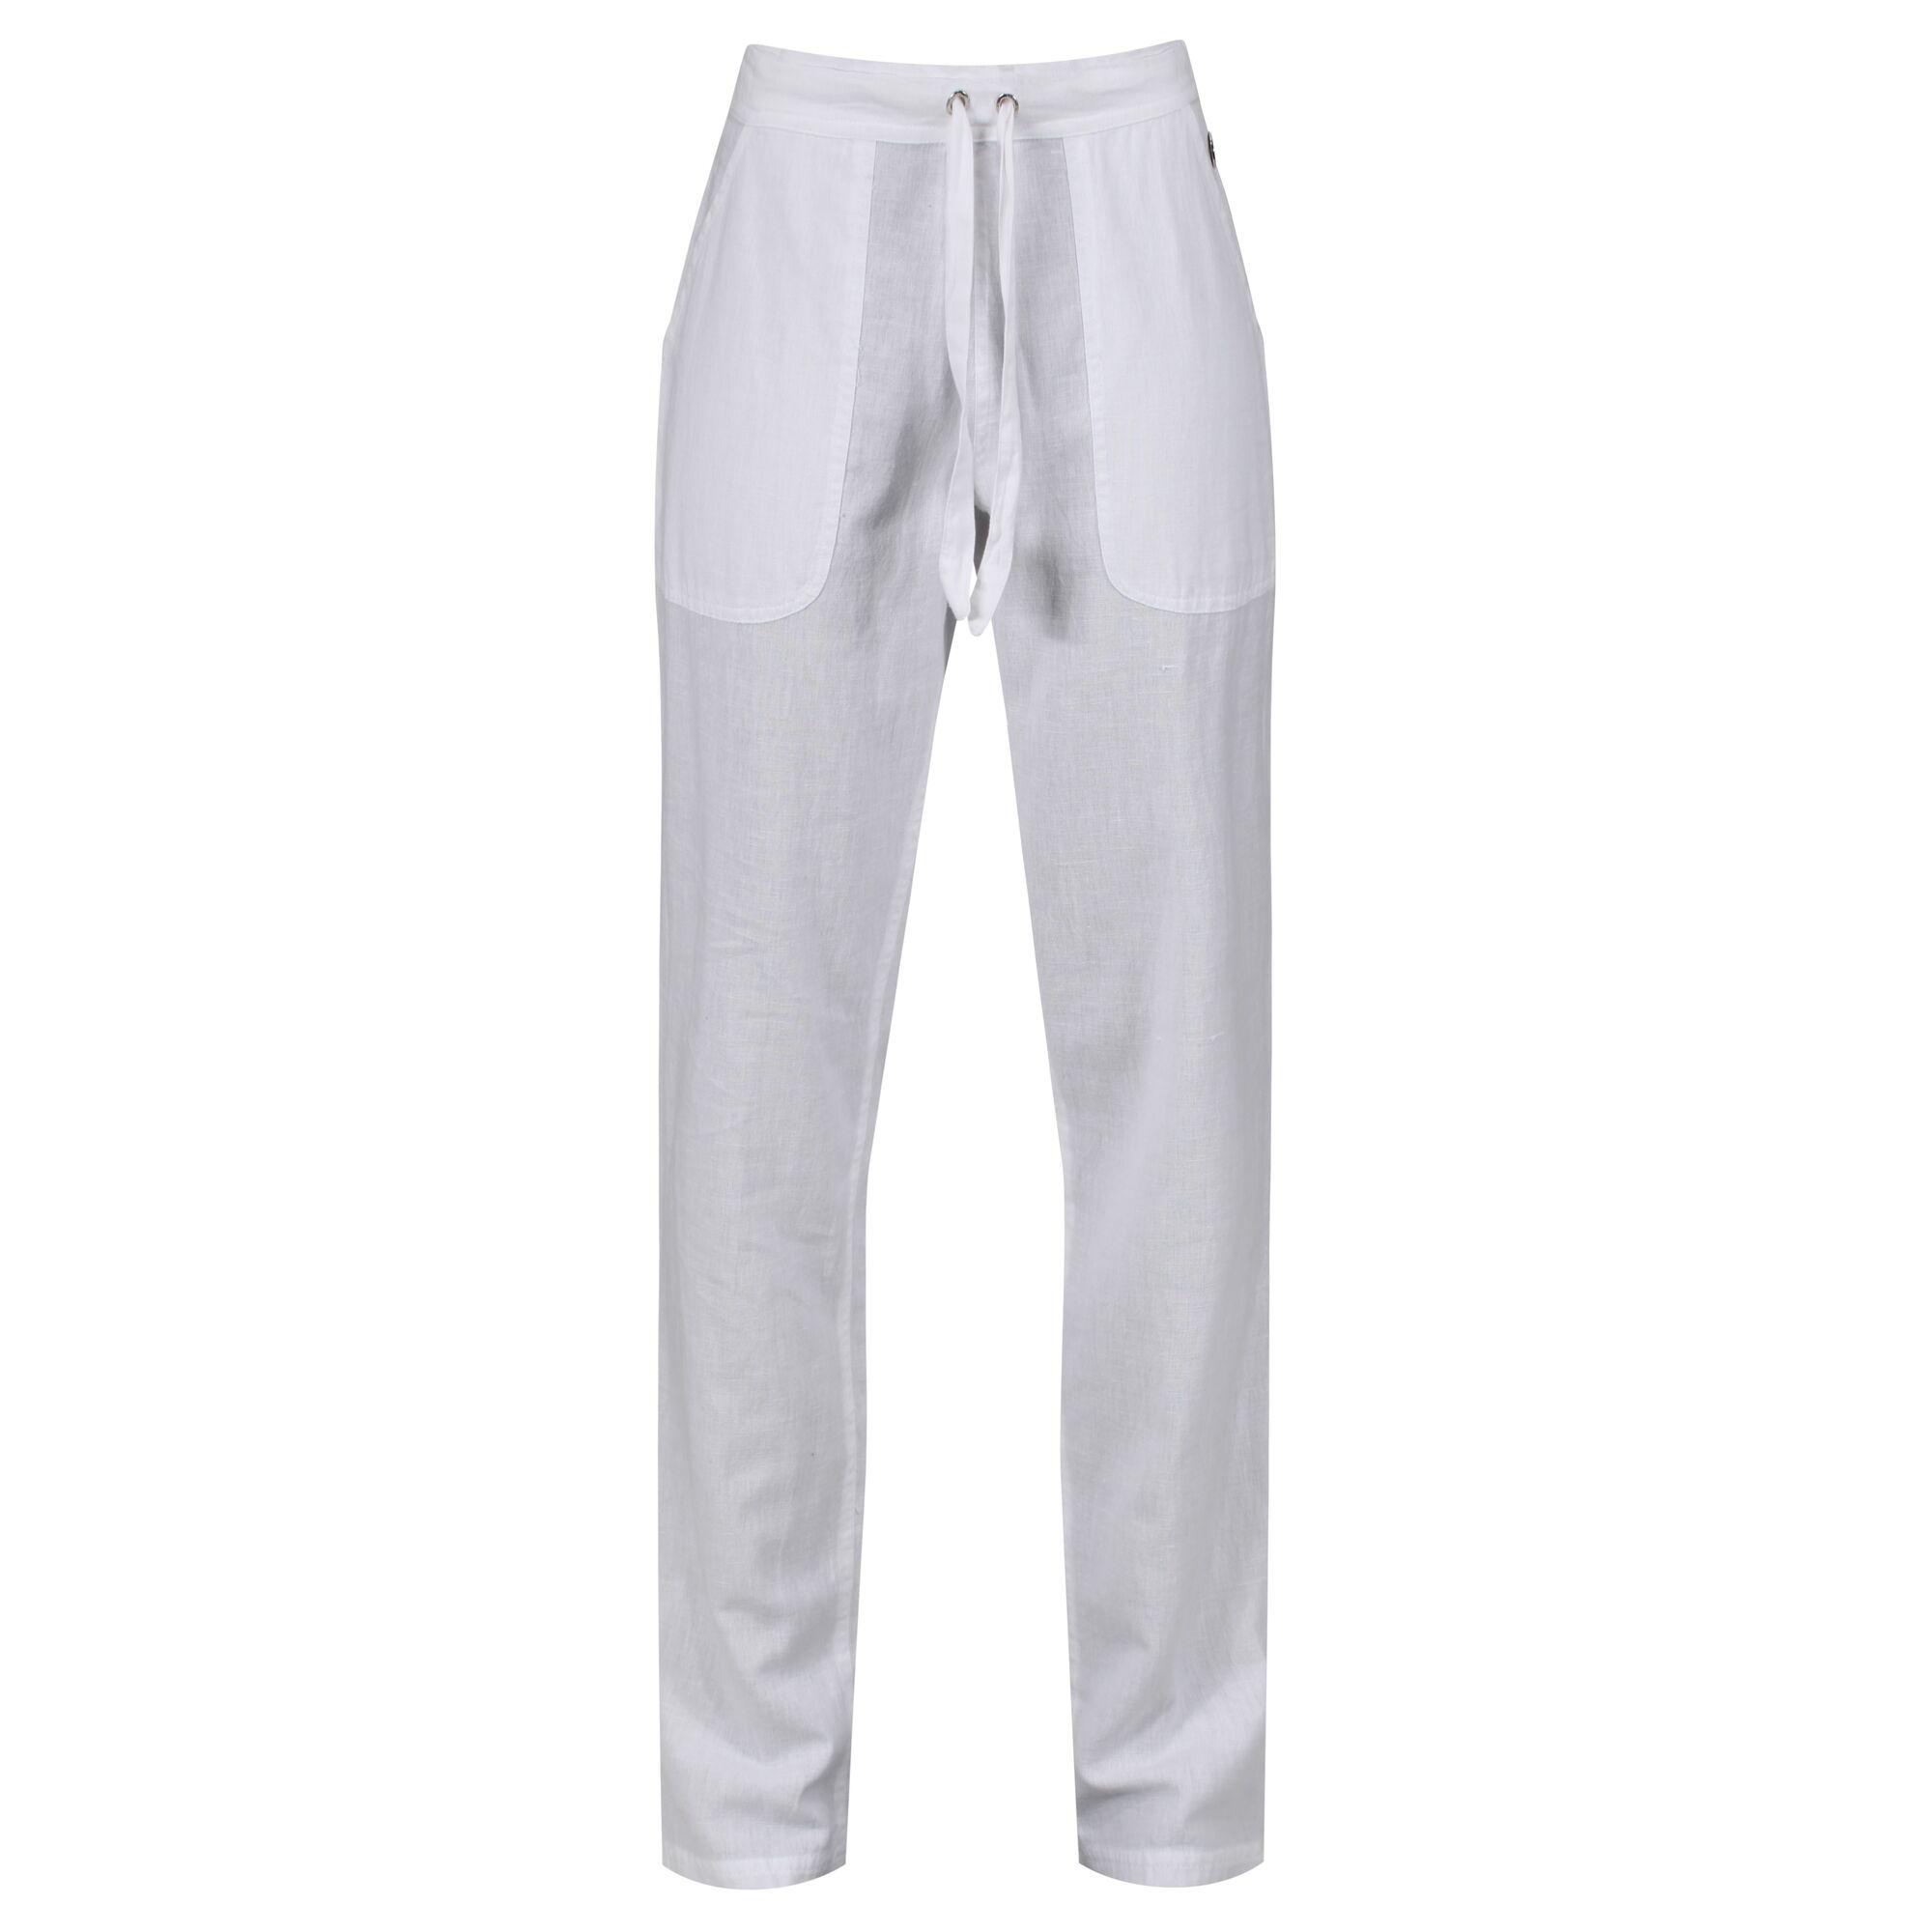 Regatta Womens/Ladies Quanda Coolweave Cotton Trousers (10 UK) (White)